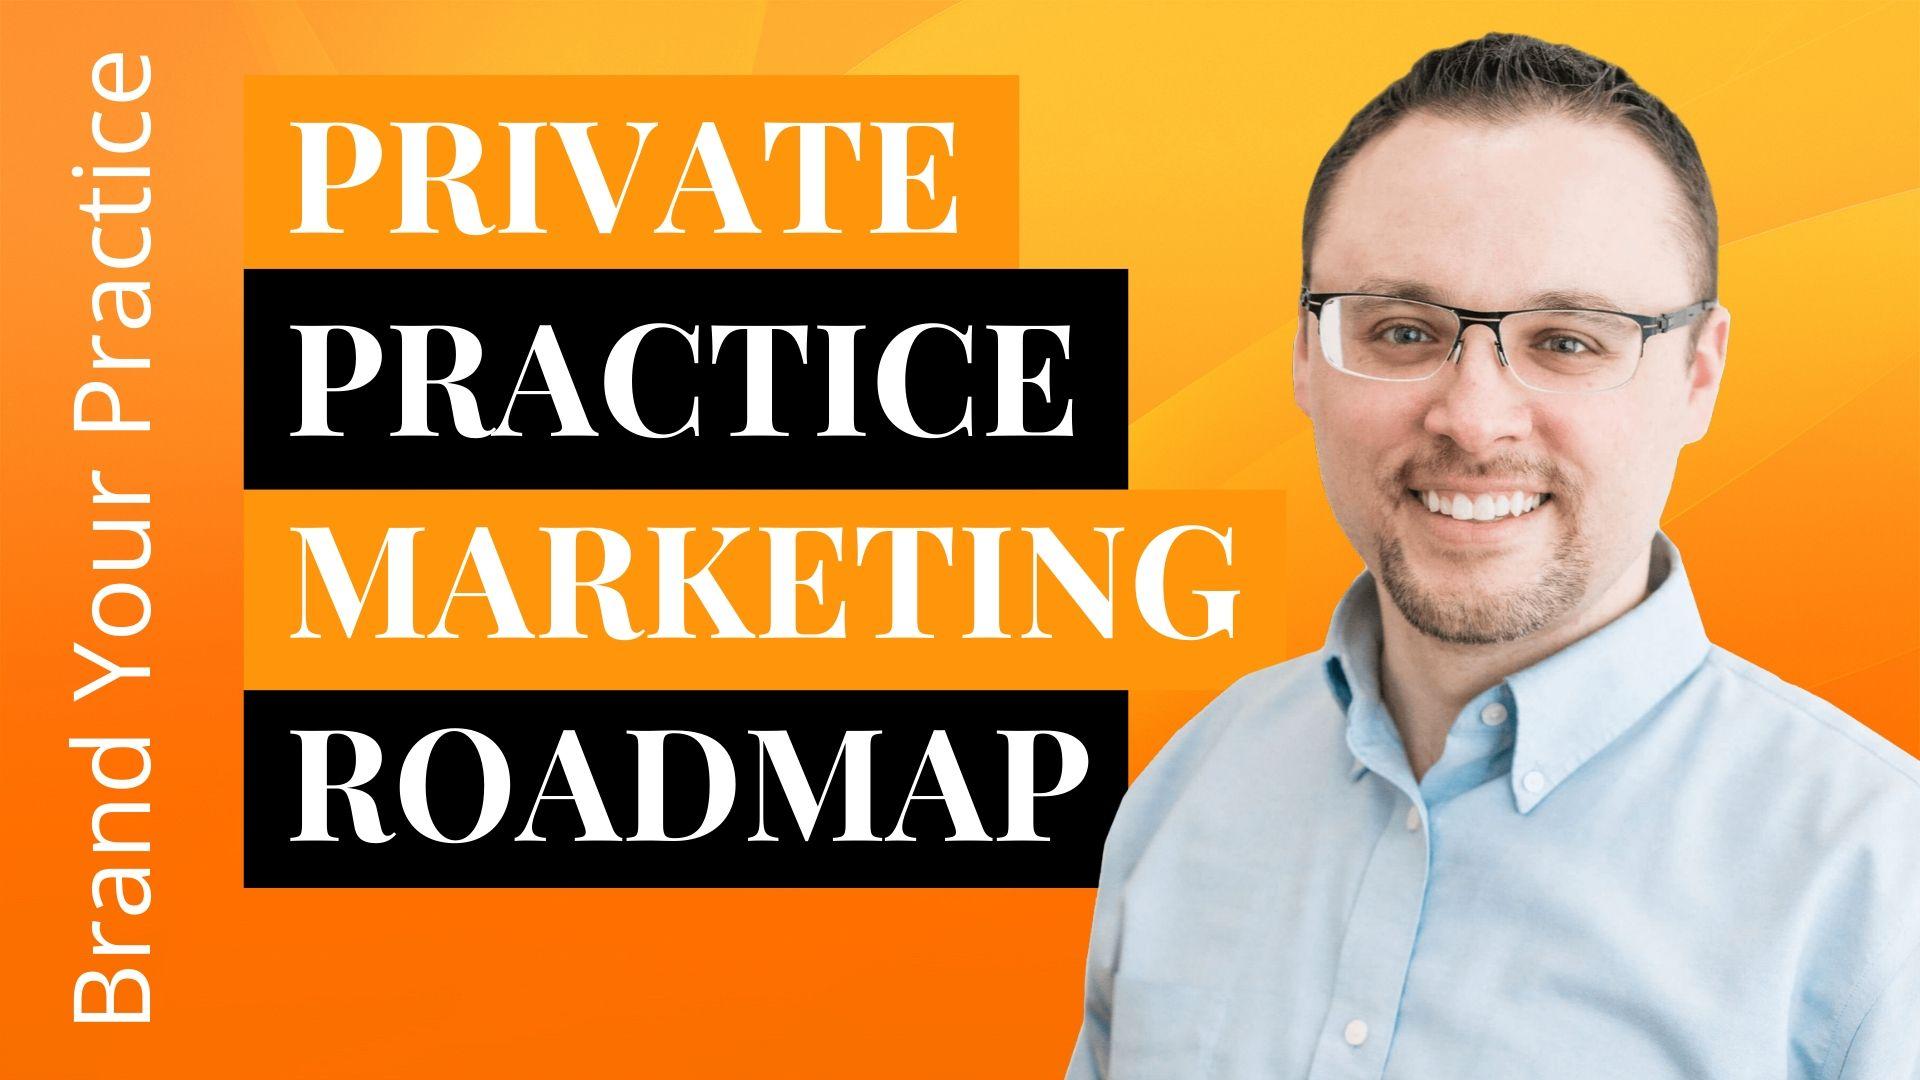 Private Practice Marketing Roadmap